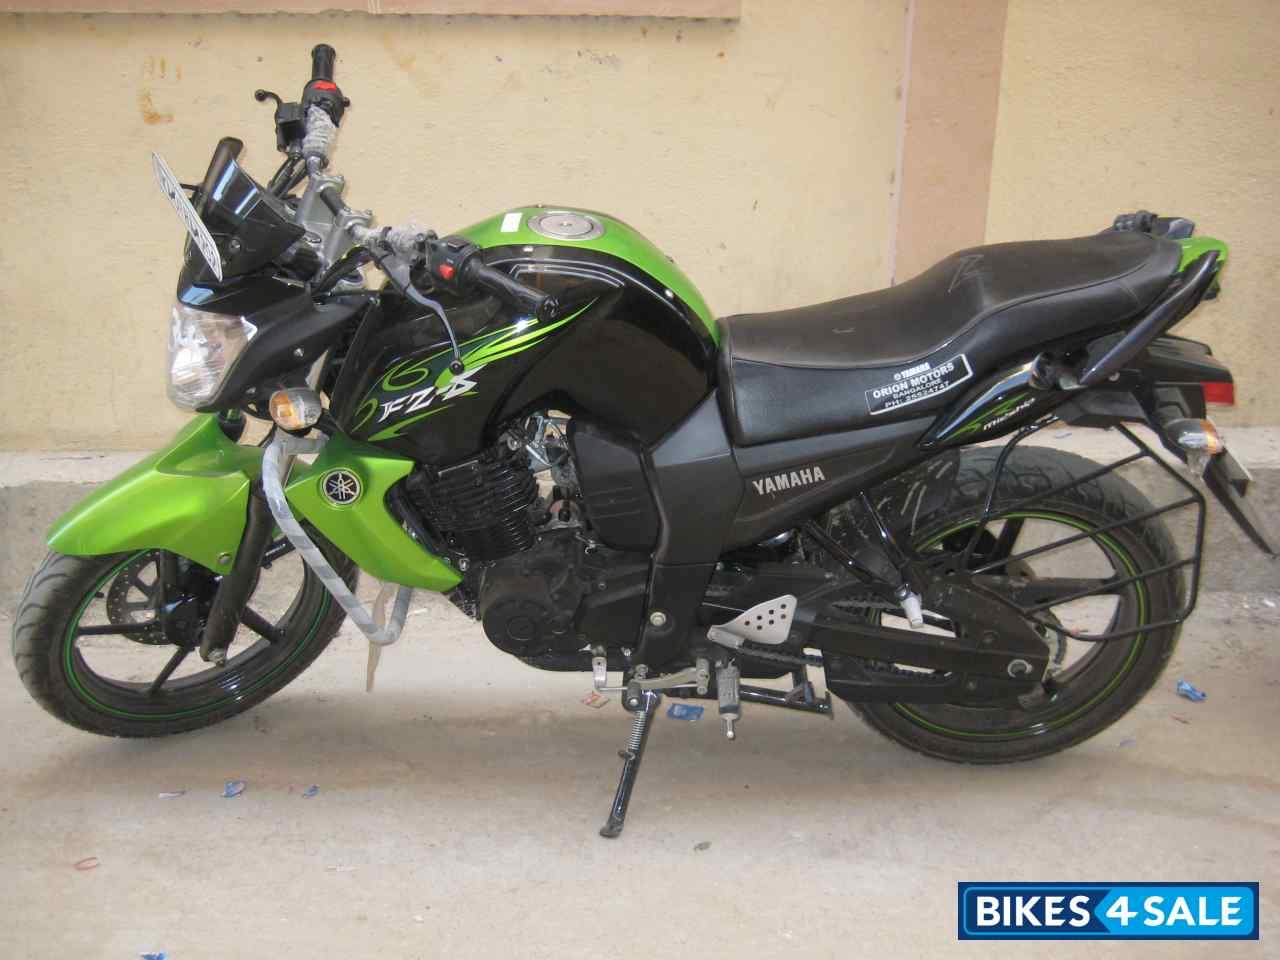 quad bike price in bangalore dating